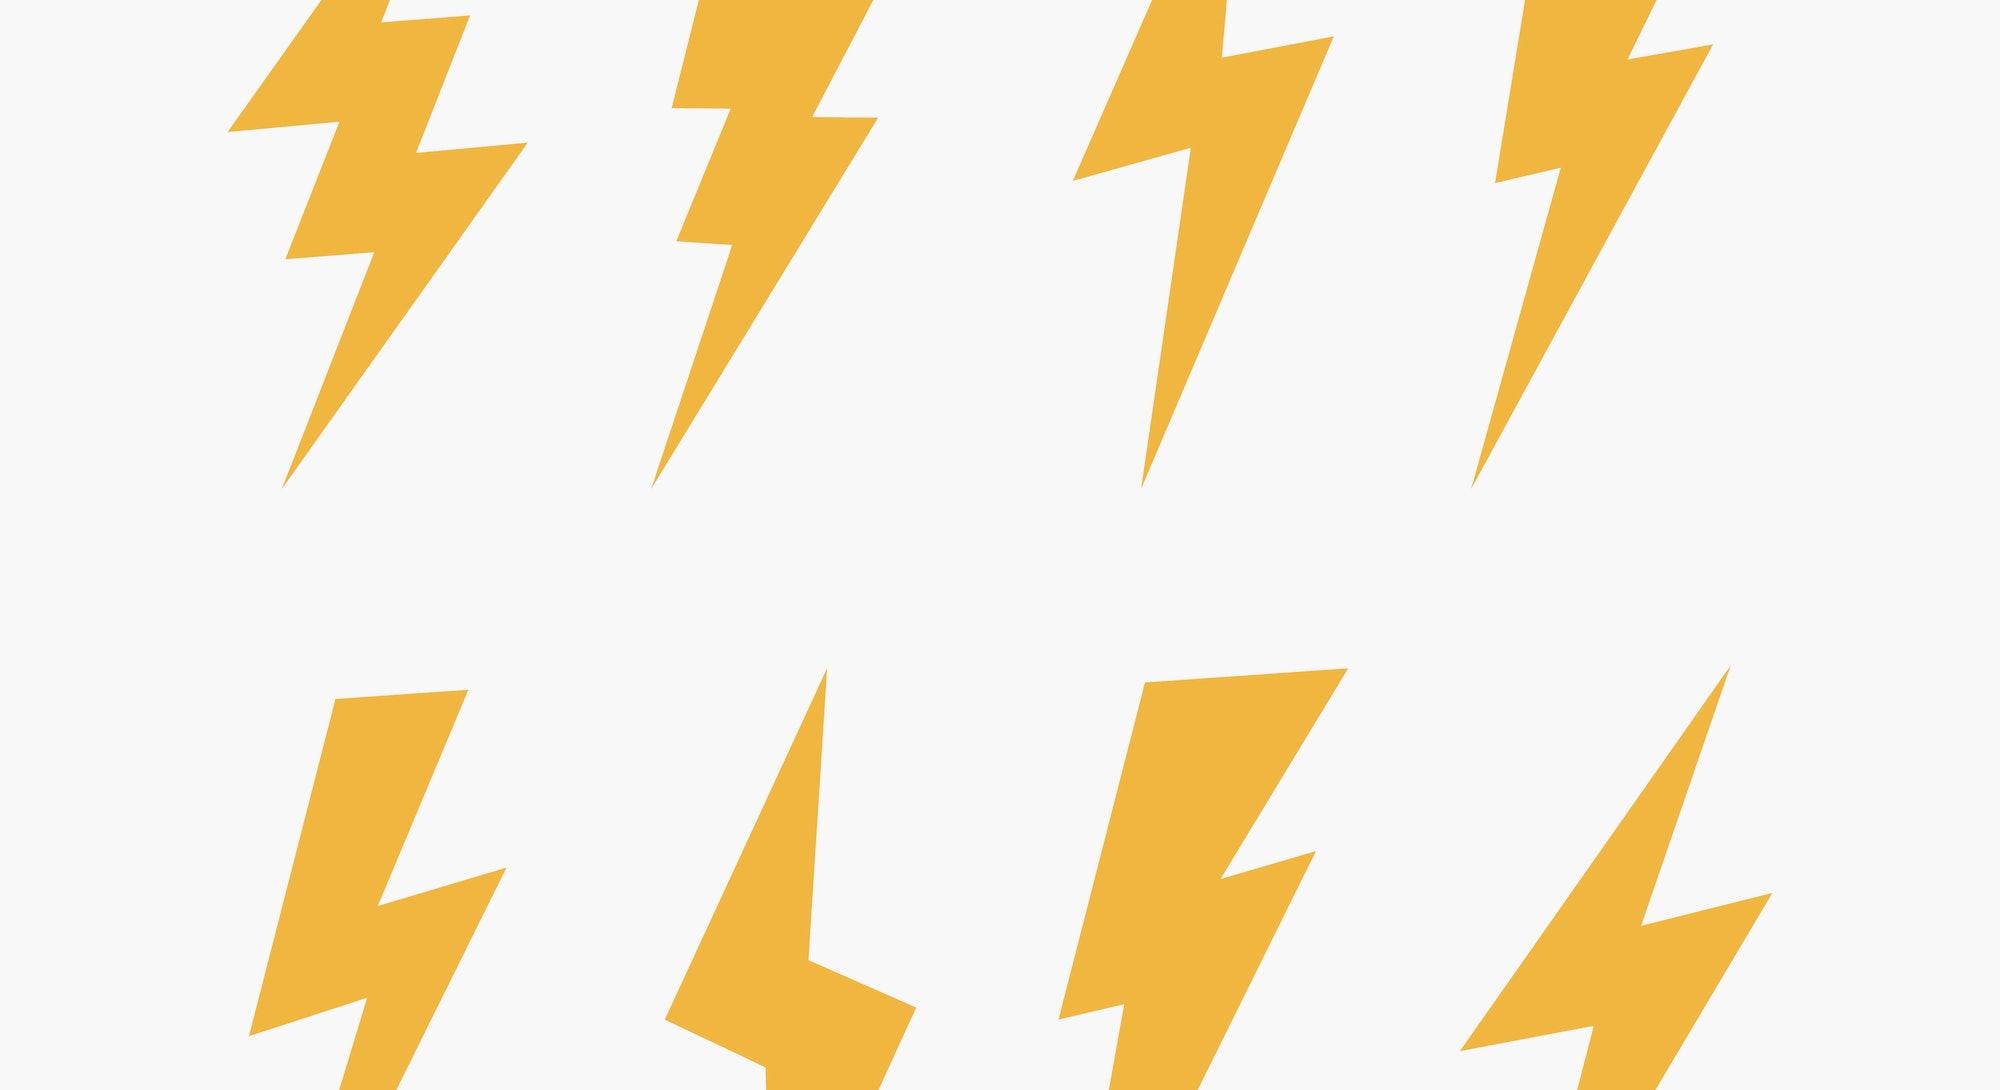 Set of 8 Lightning flat icons. Thunderbolts icons isolated on black background. Vector illustration